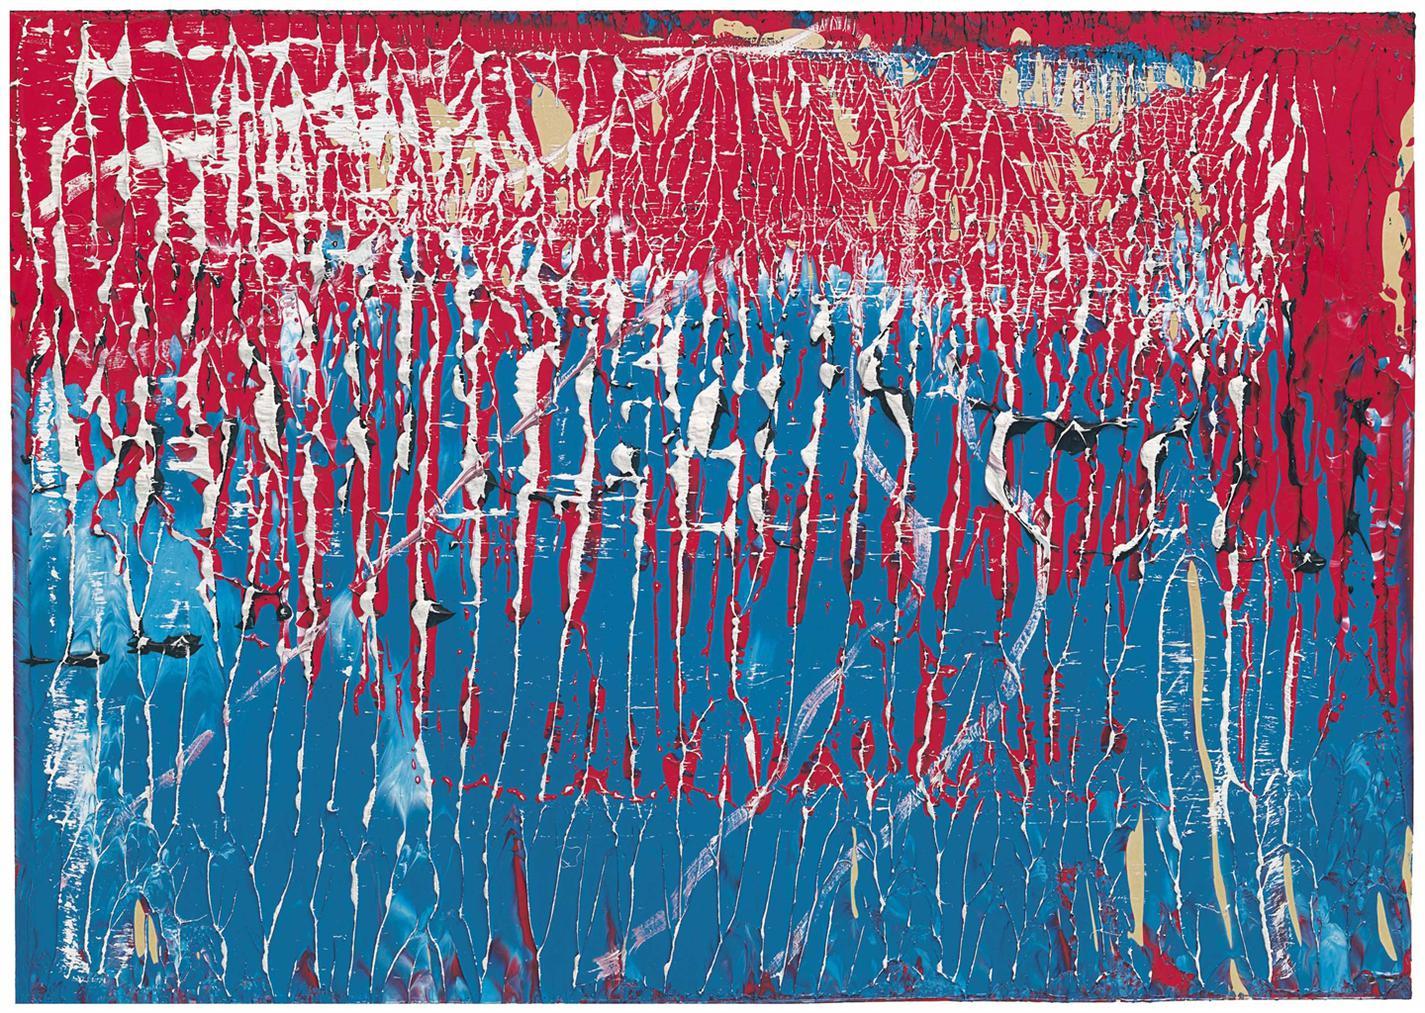 Gerhard Richter-15.2.88-1988